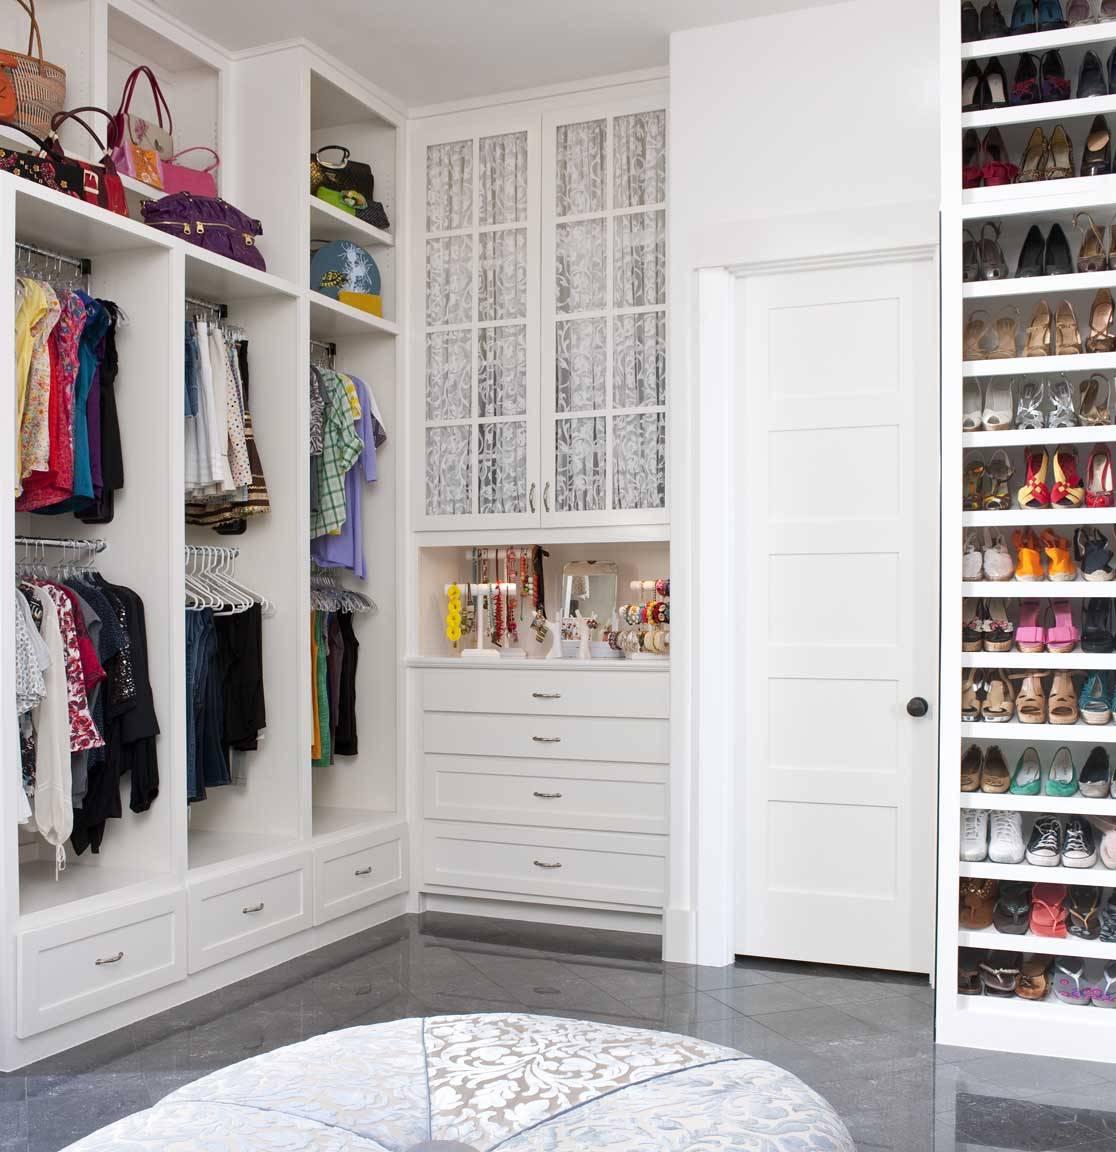 buit it closet wall mounted shoes rack open shelves jewelry shelf